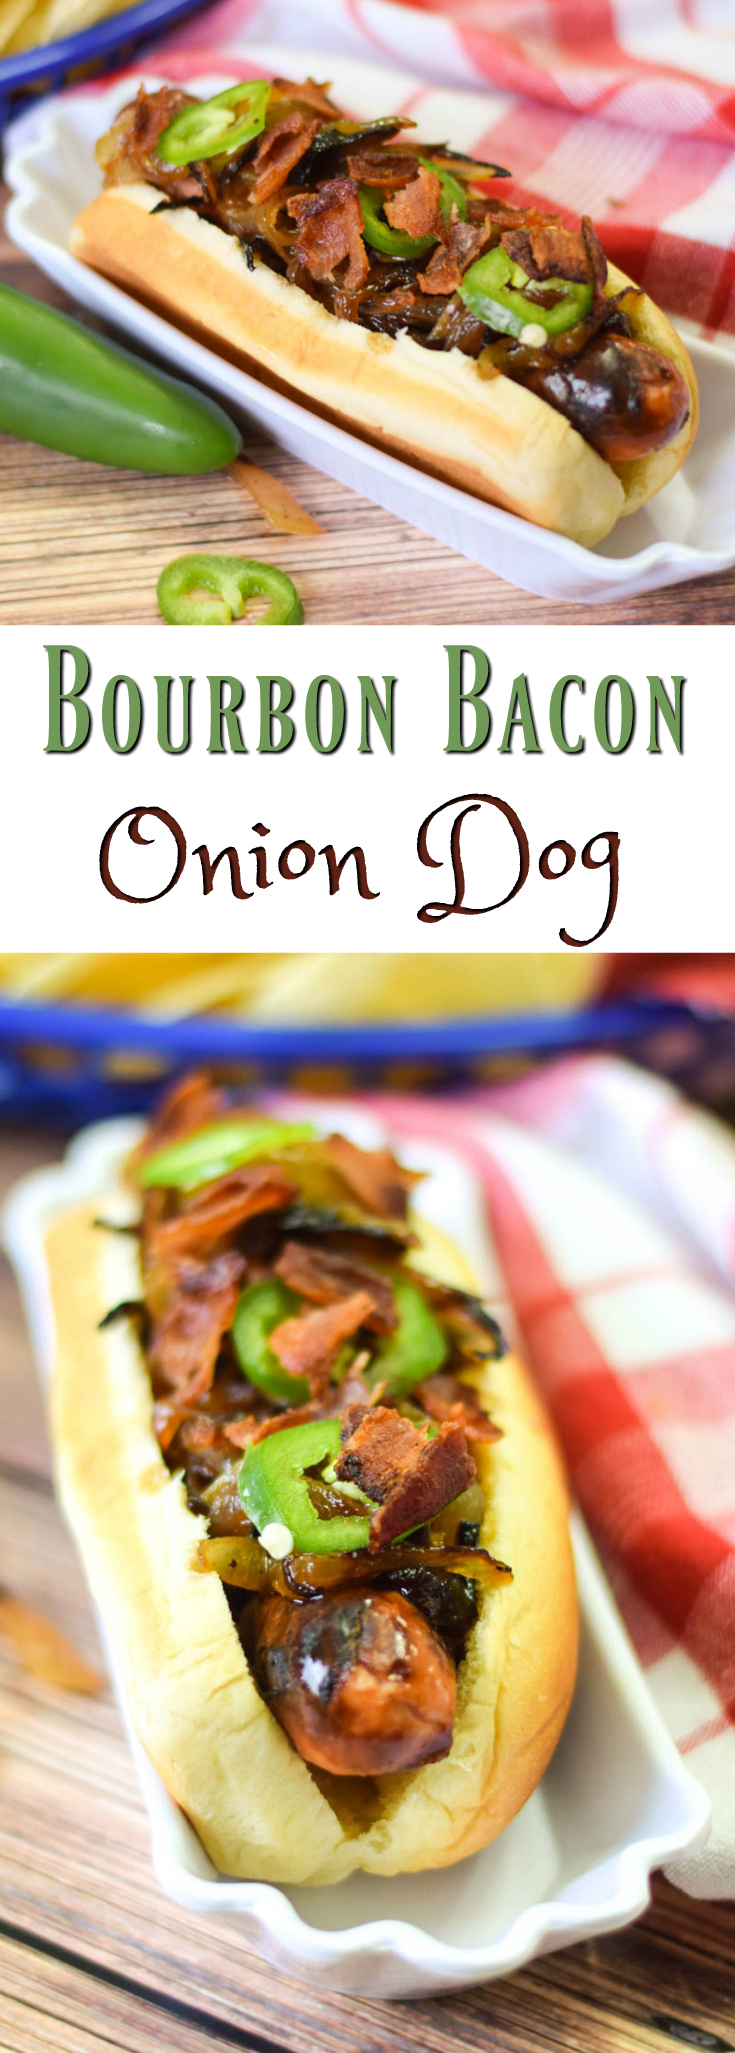 Bourbon Bacon Onion Dog